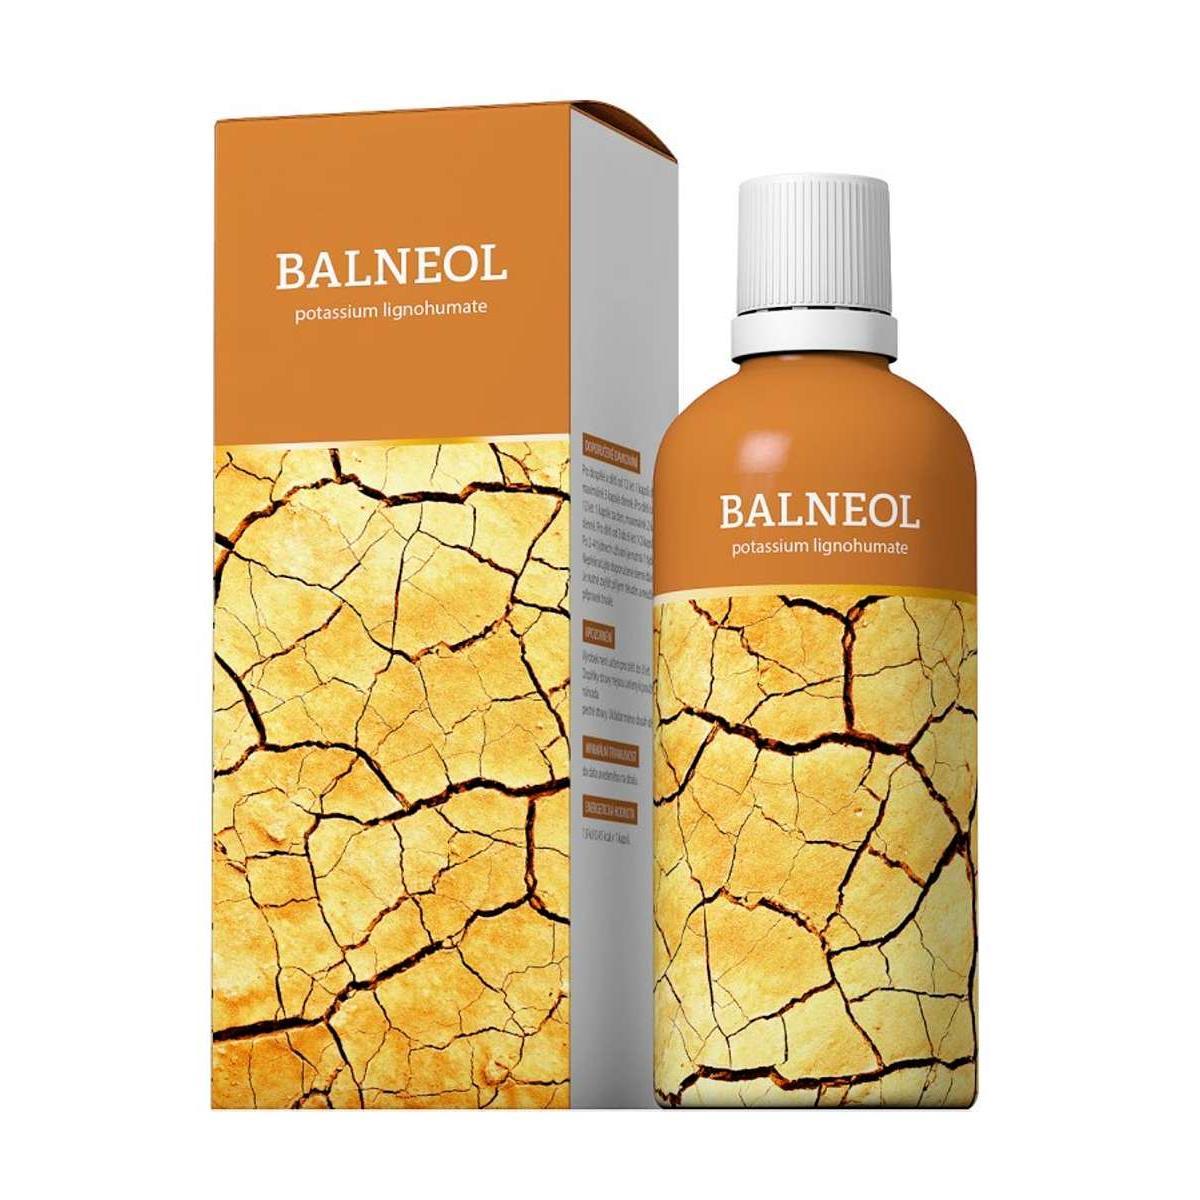 Balneol - 100ml